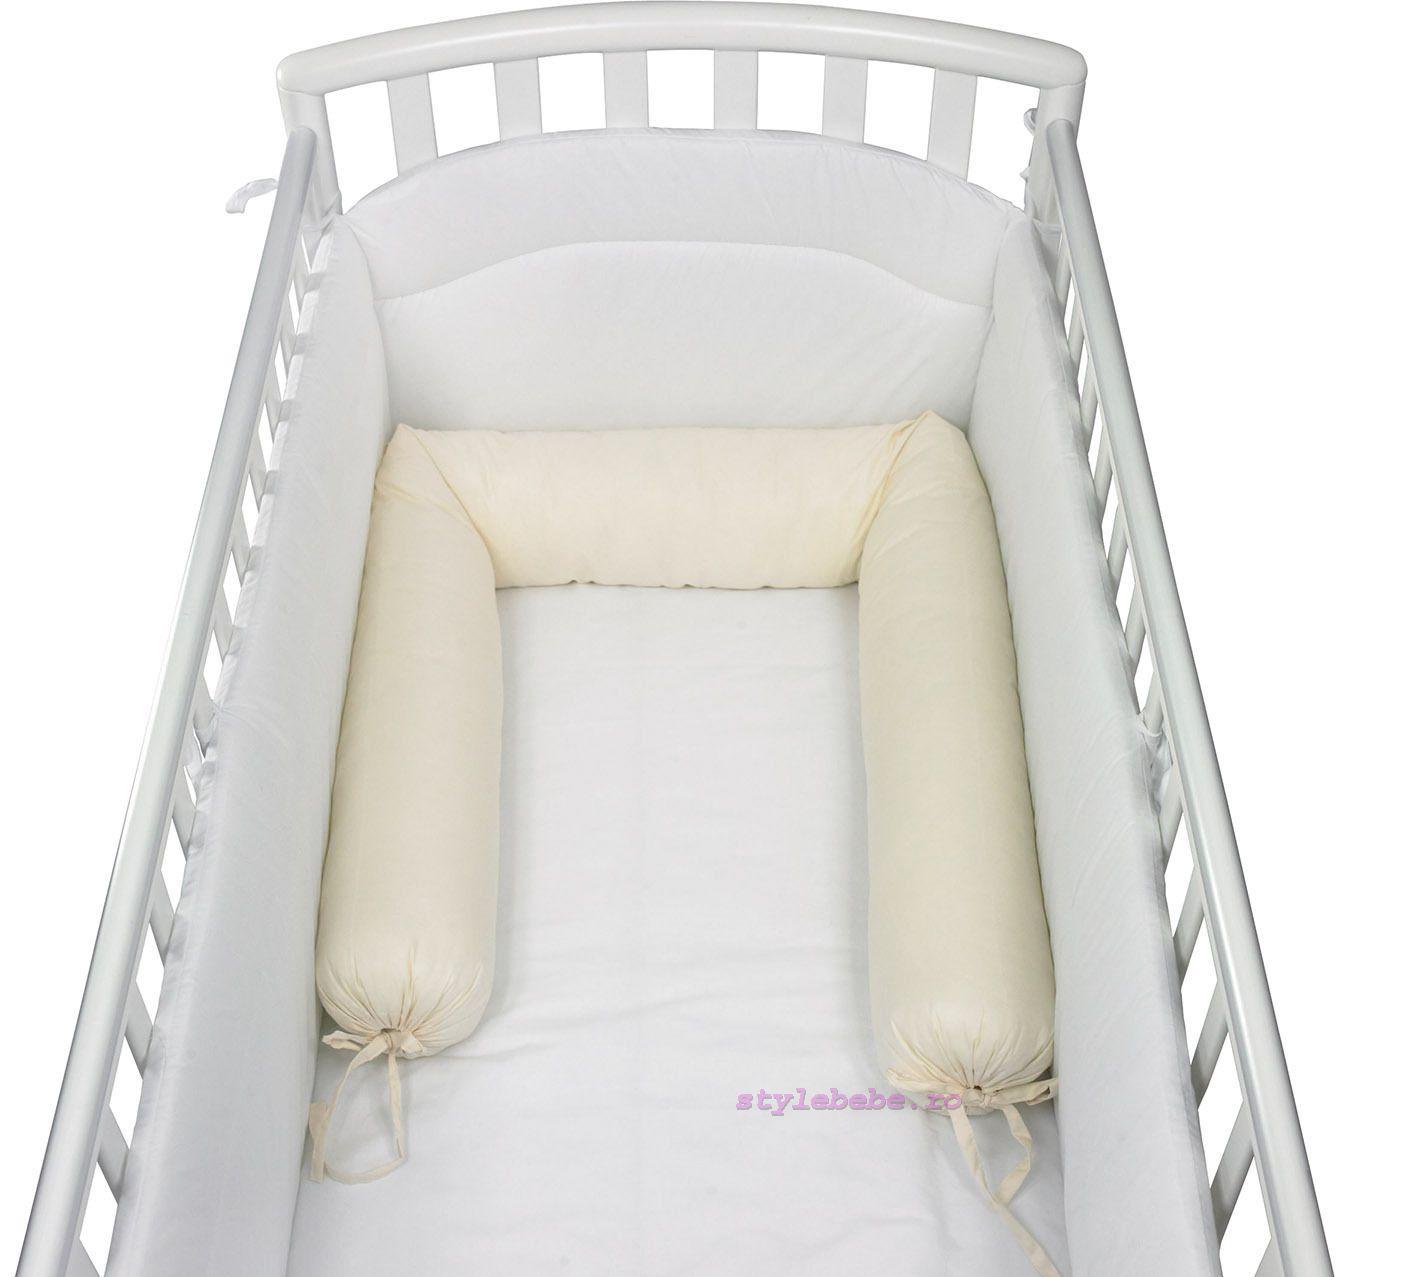 Protectie reductoare patut bebe